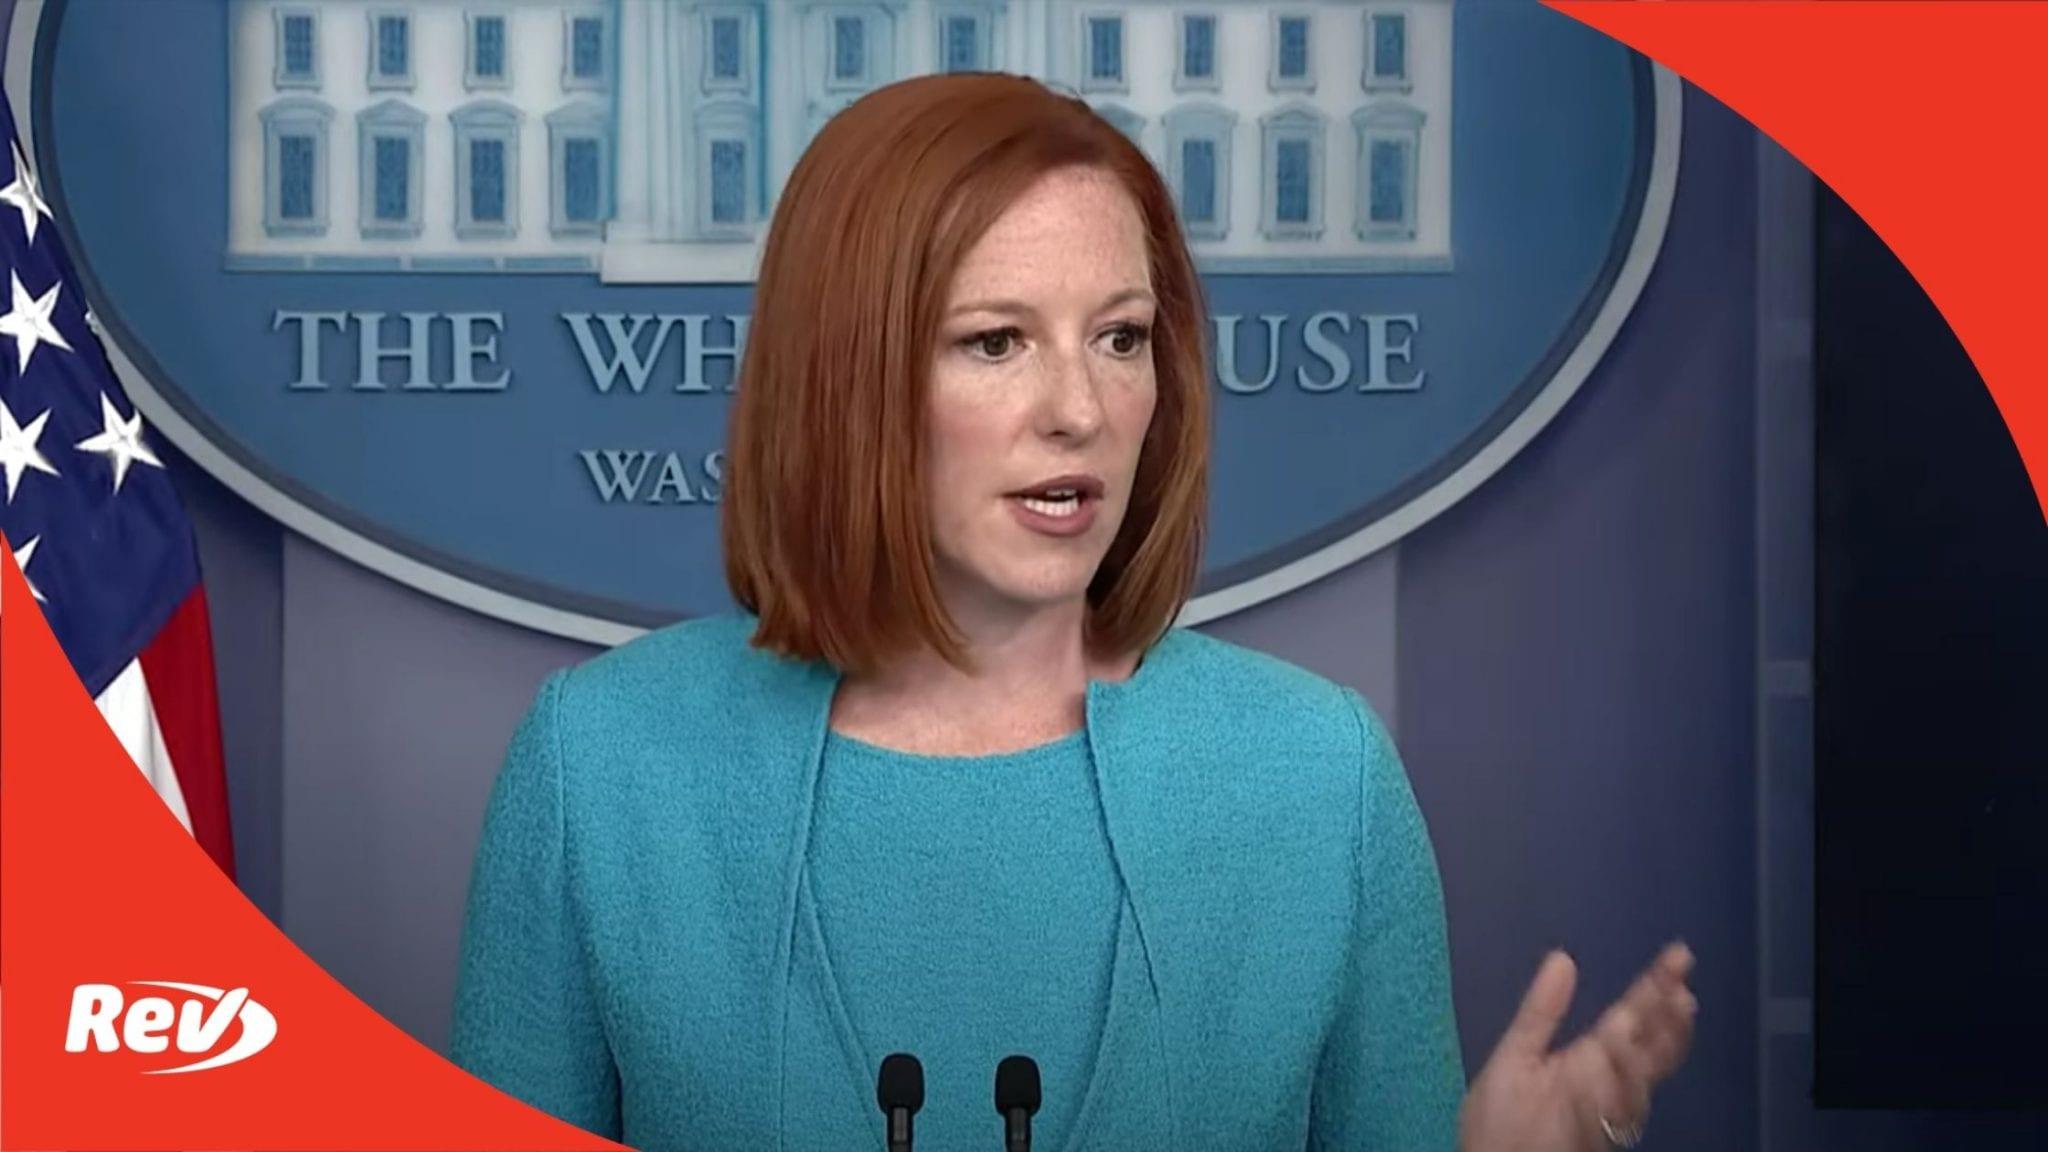 Press Secretary Jen Psaki White House Press Conference Transcript July 15